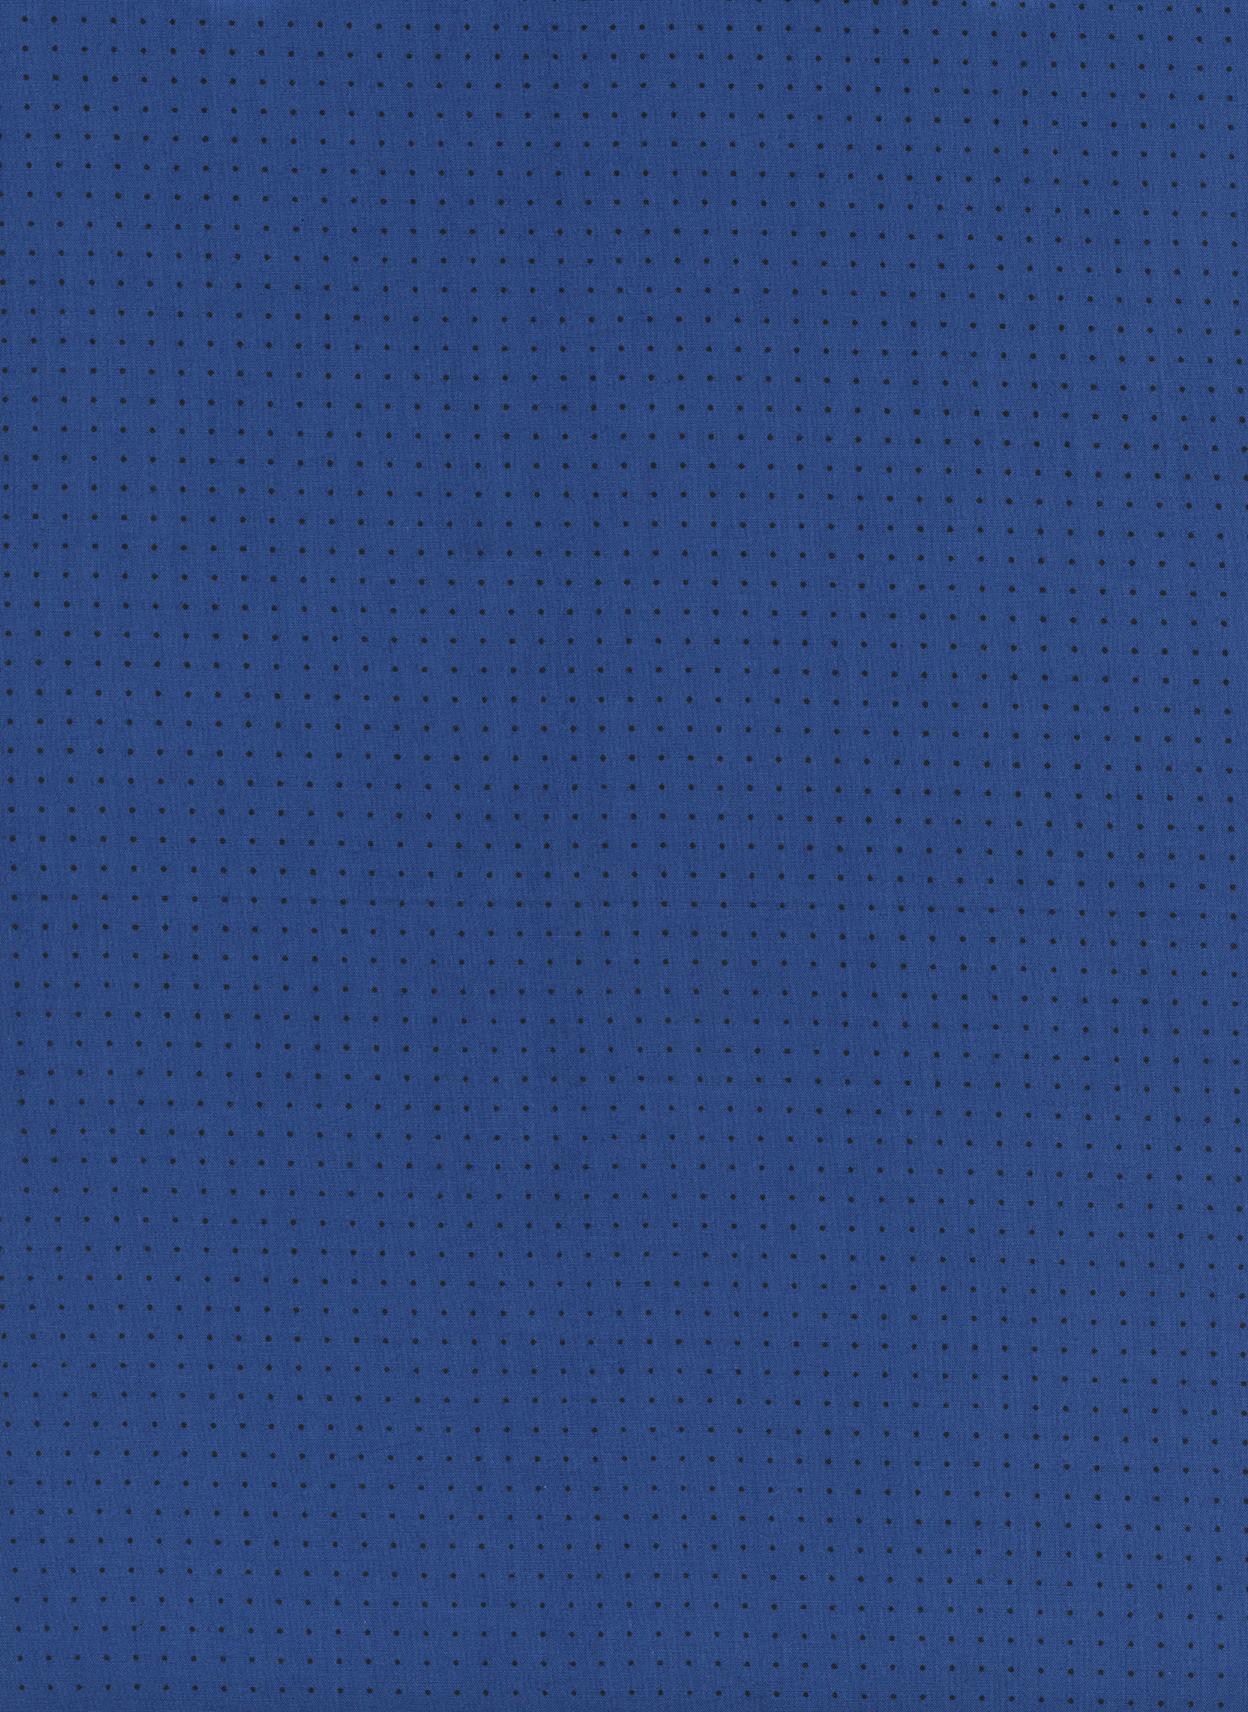 0f656328bba3 M0056-026 Kicks - Pin Dot - Indigo Rayon Lawn Fabric